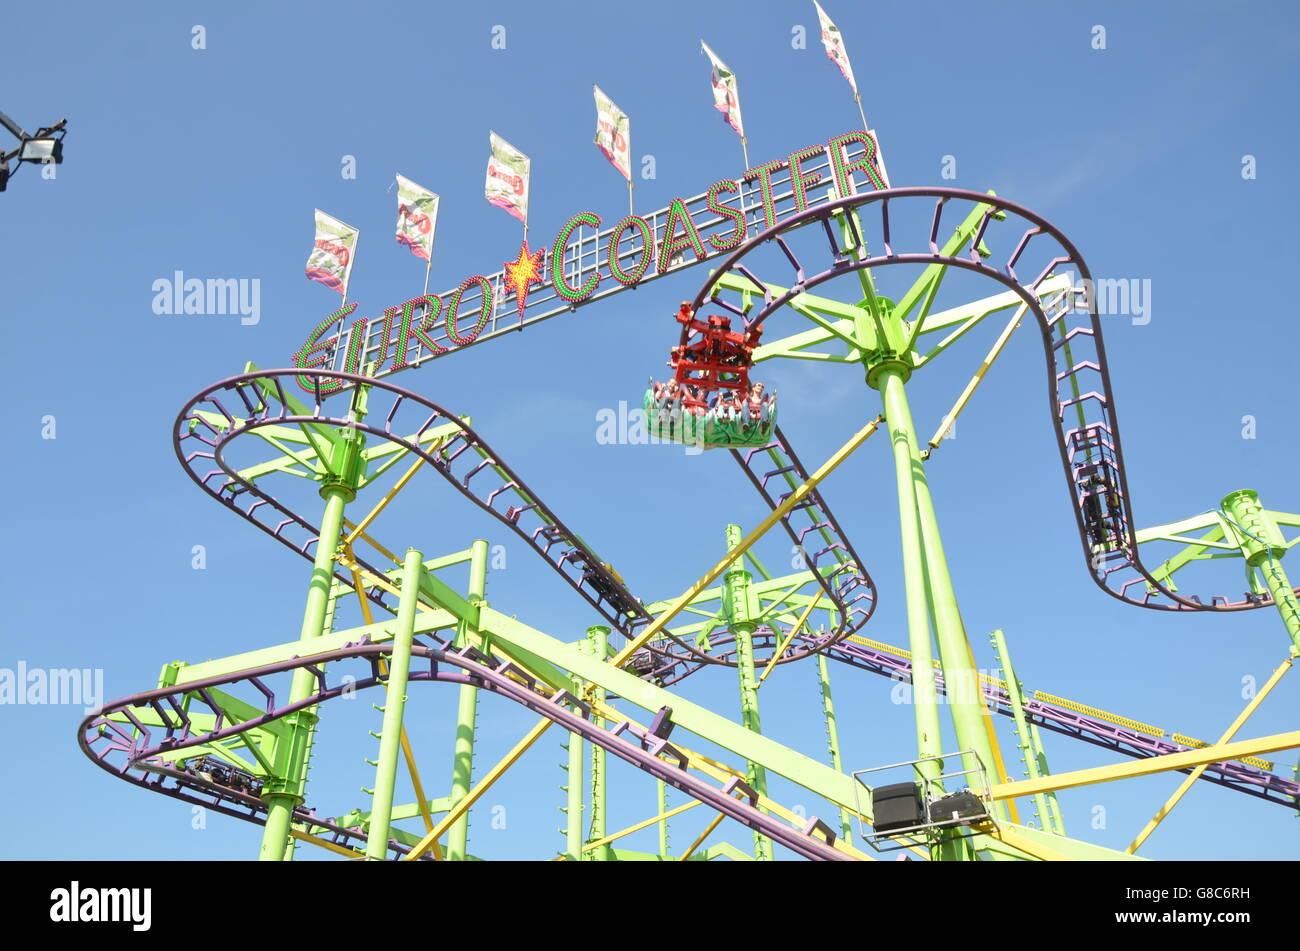 Euro coaster adrenalin, amusement park, - Stock Image